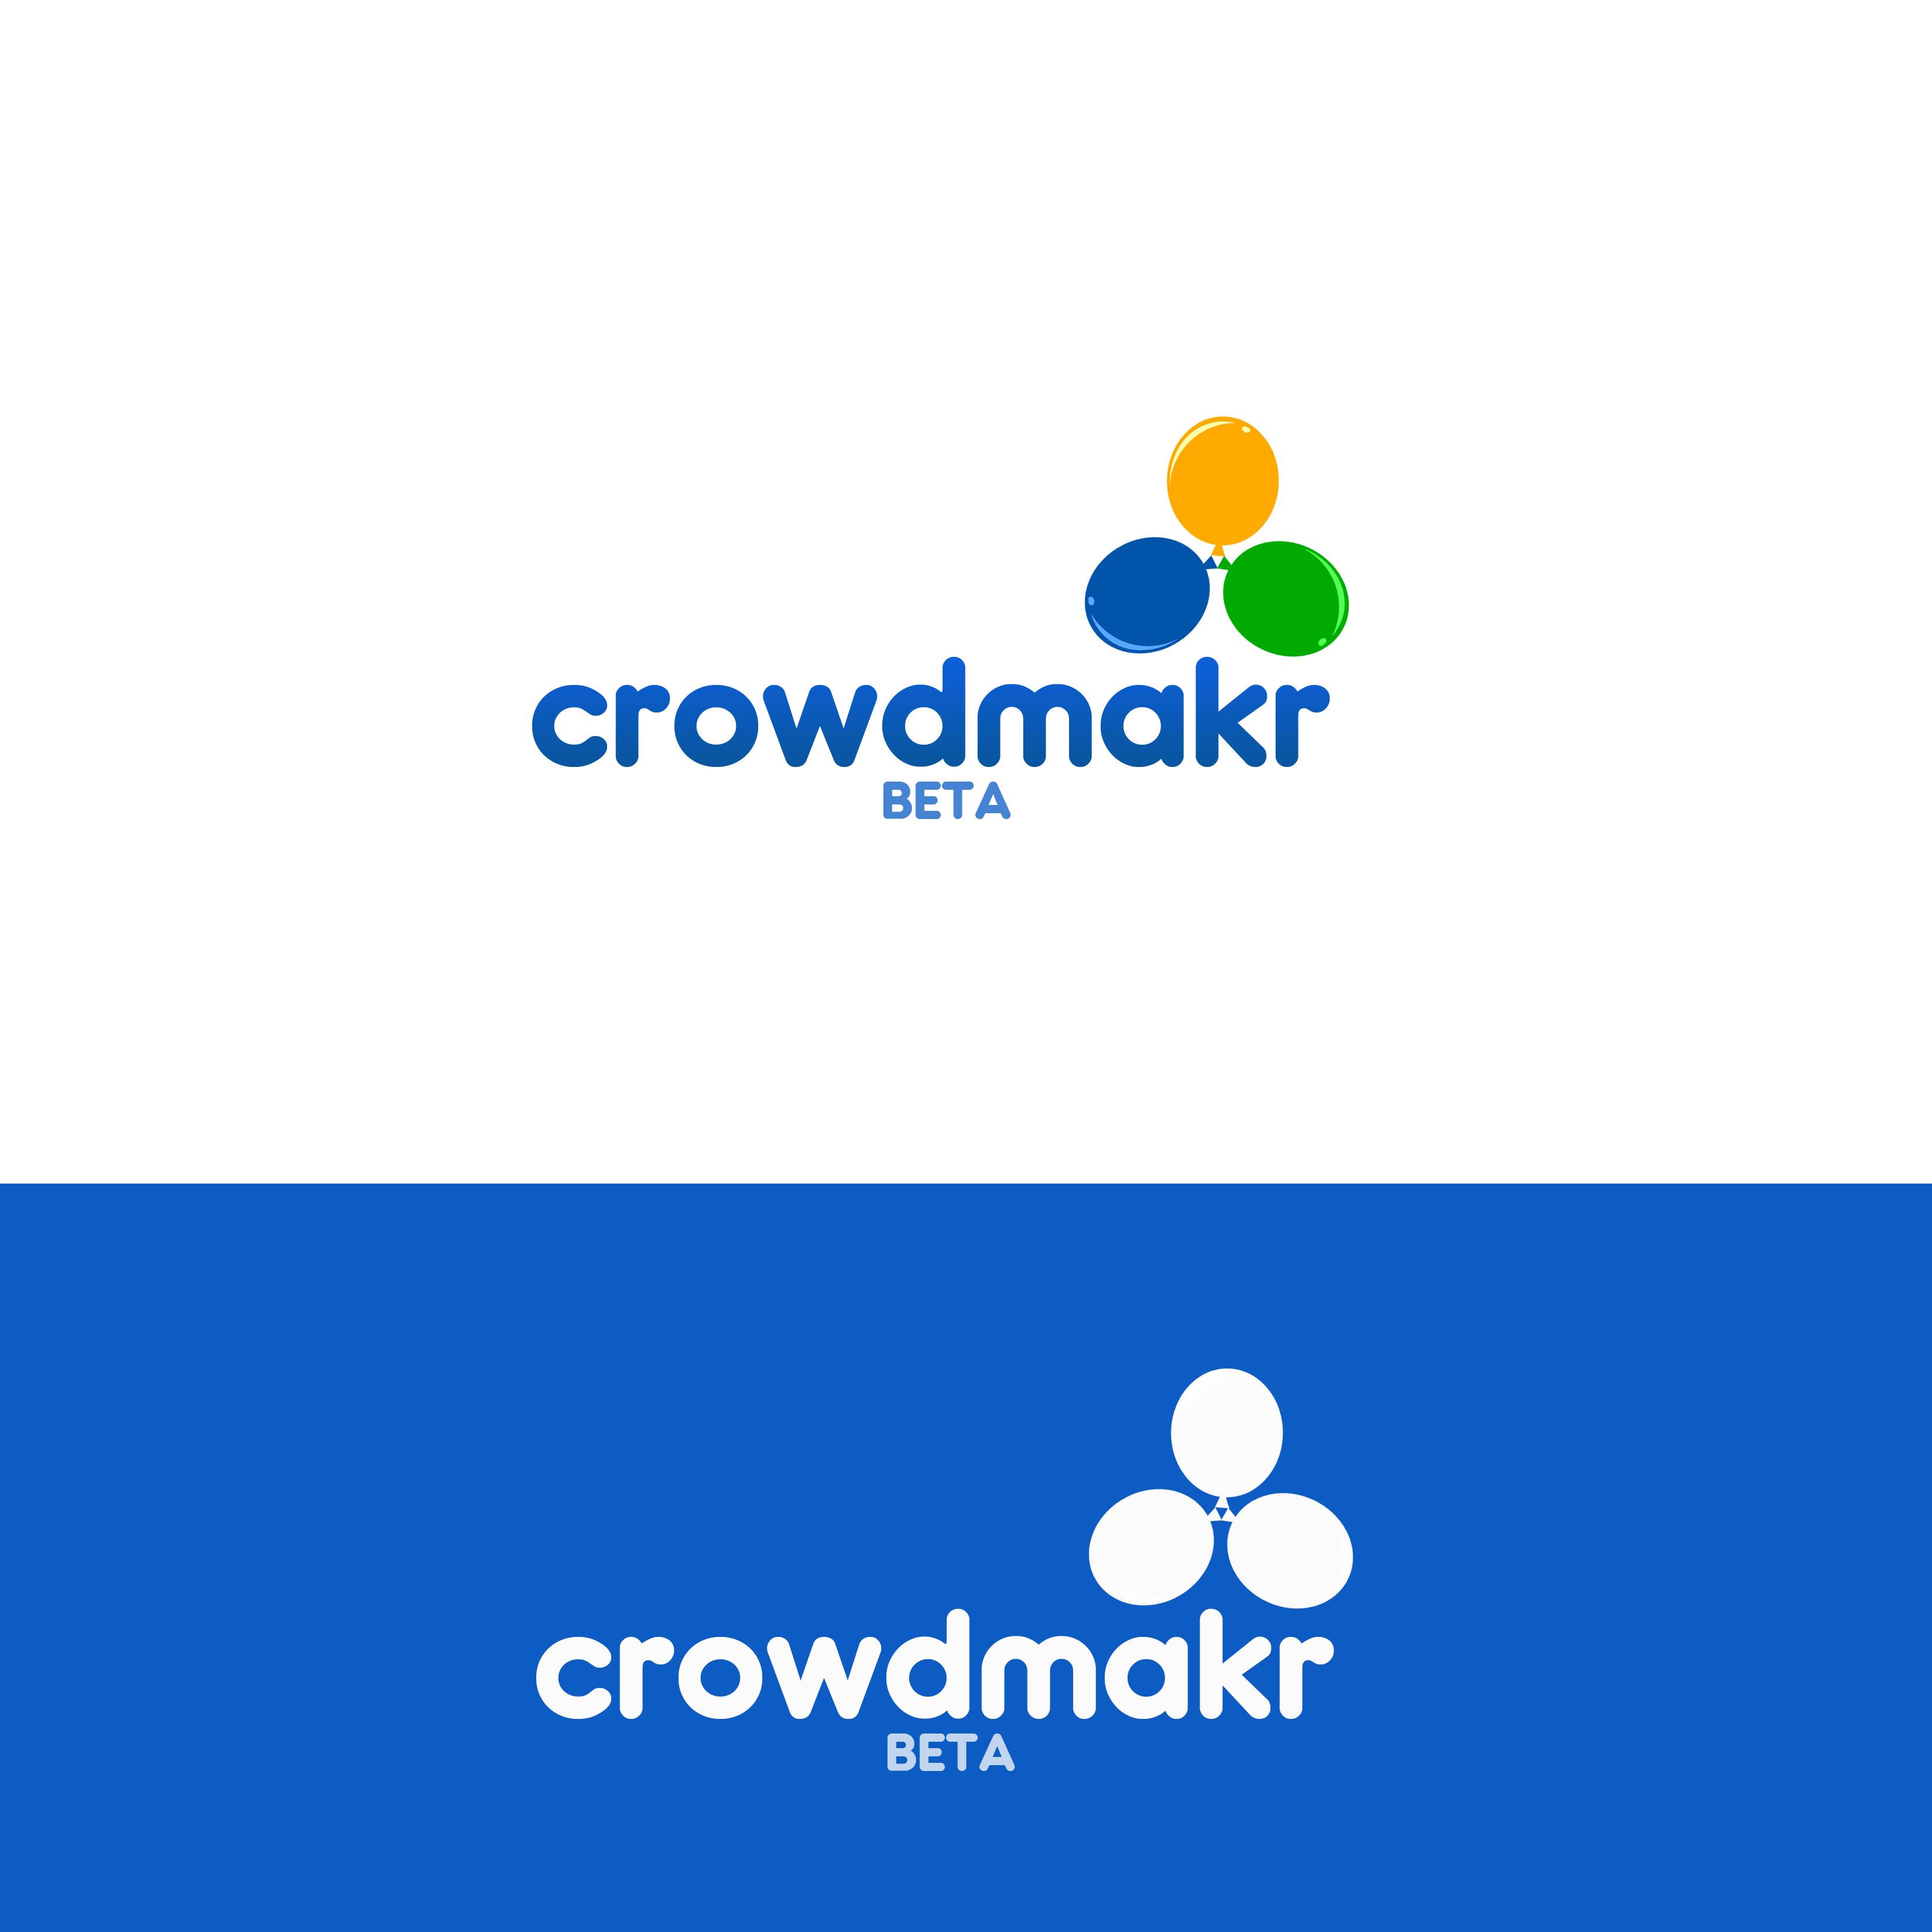 Logo Design by Allan Esclamado - Entry No. 98 in the Logo Design Contest Unique Logo Design Wanted for crowdmakr.